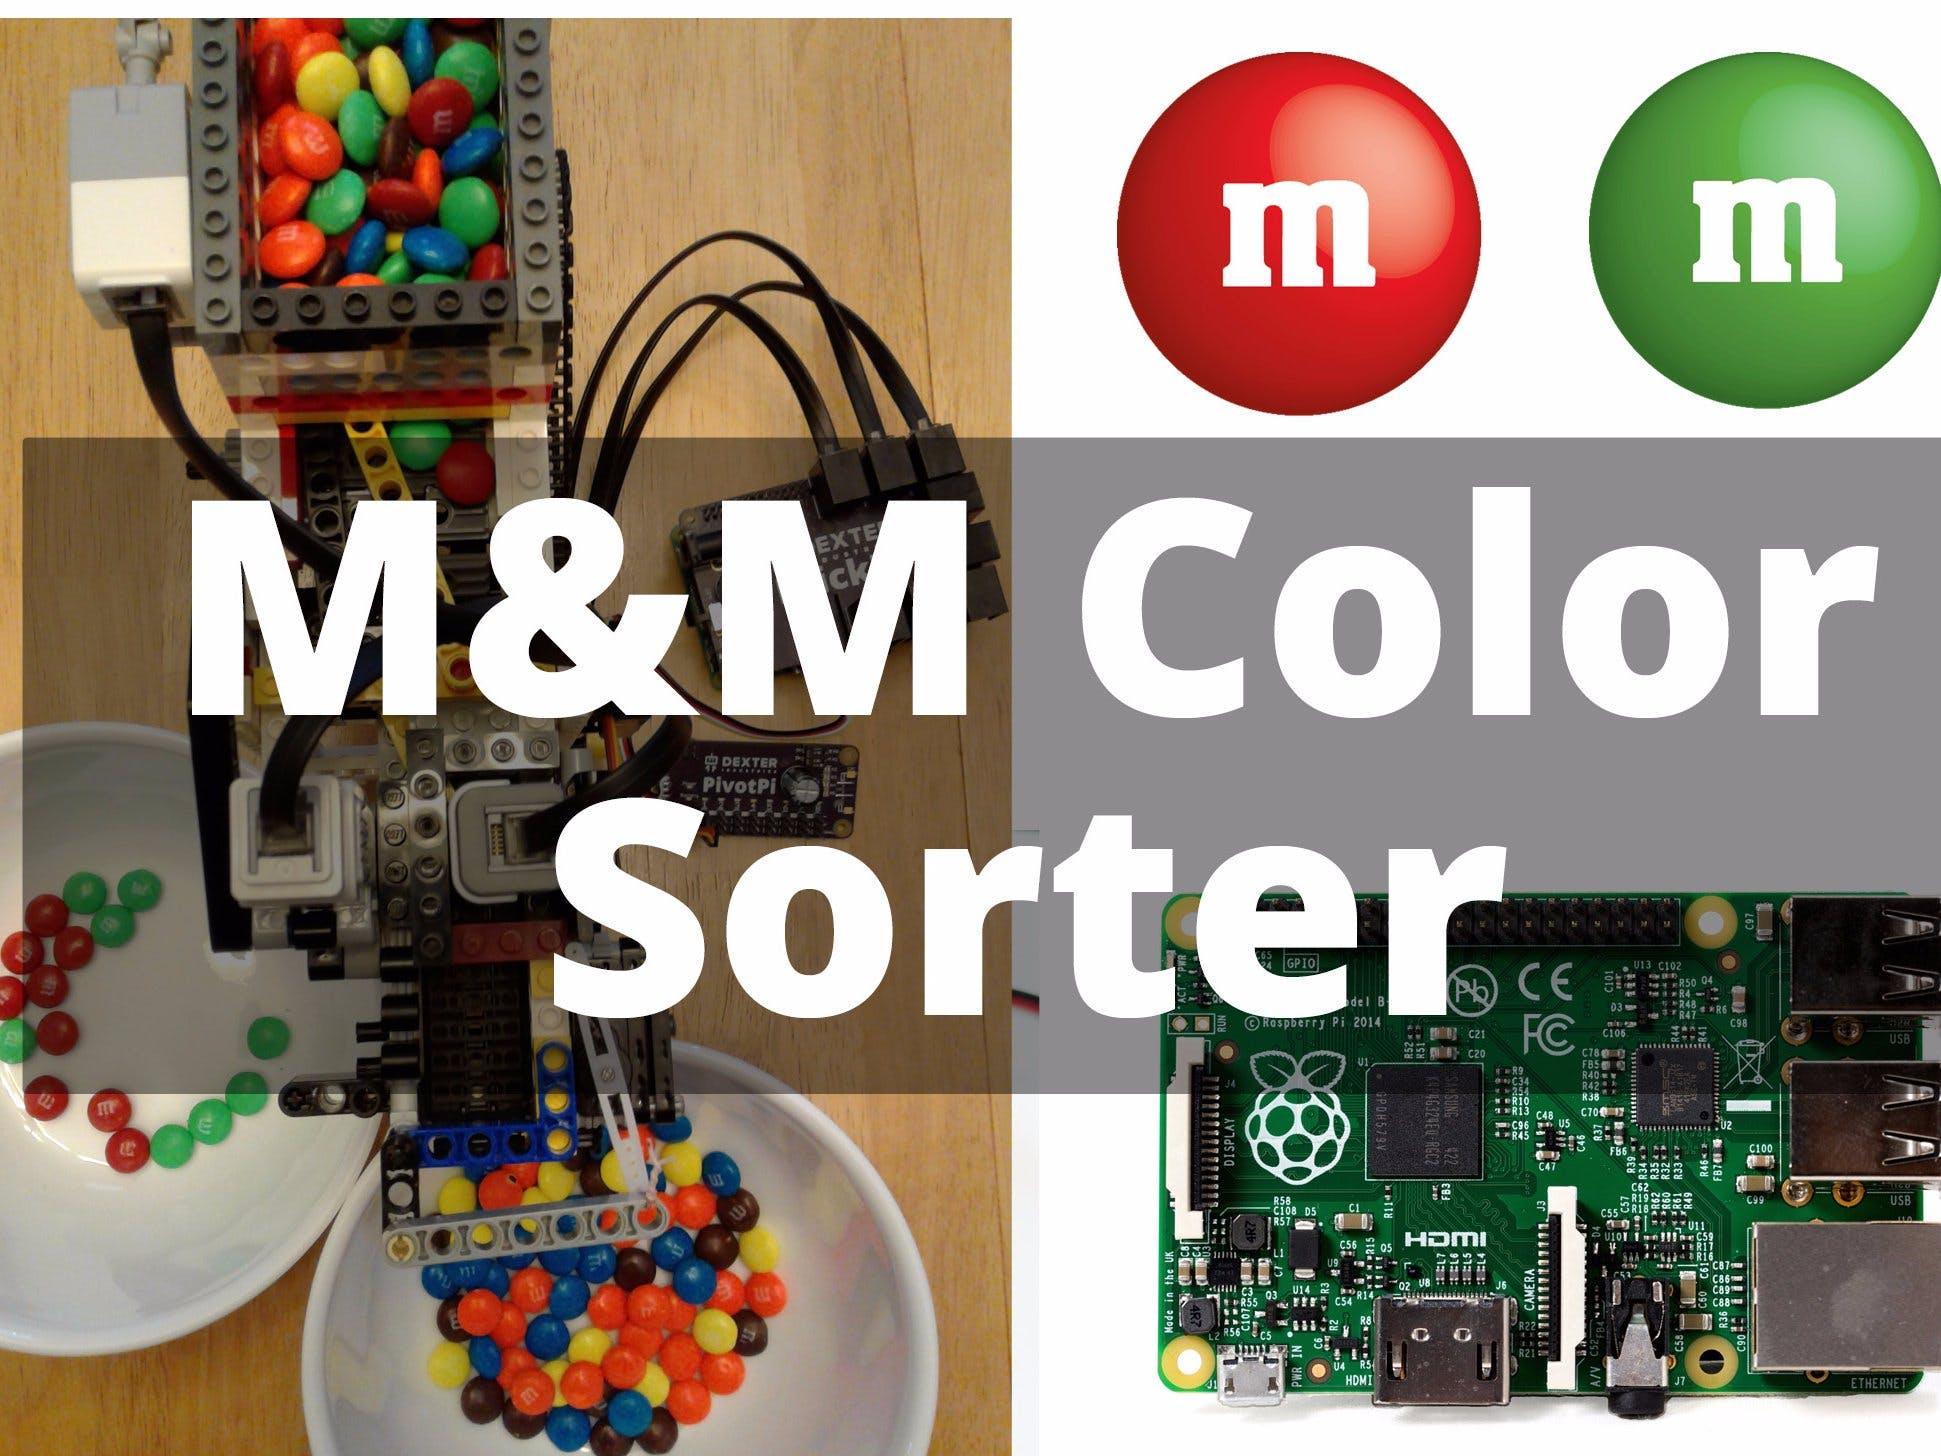 Raspberry Pi M&M Sorter - Hackster.io